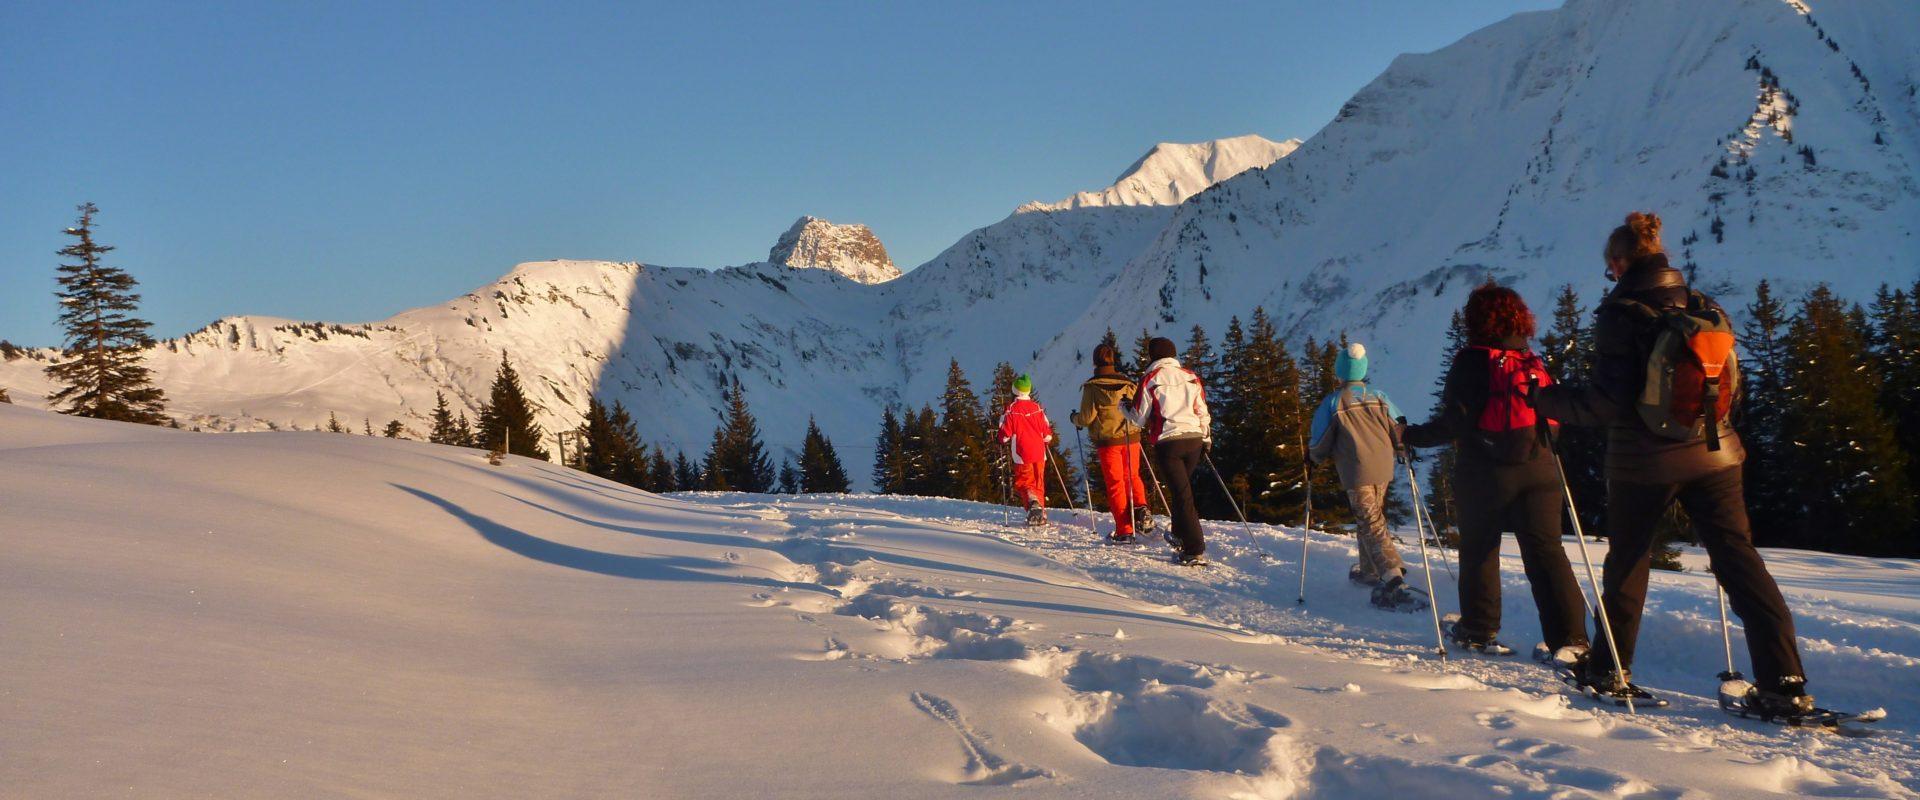 Panorama Schneeschuhtour mit Moses_Markus Moosbrugger (1)